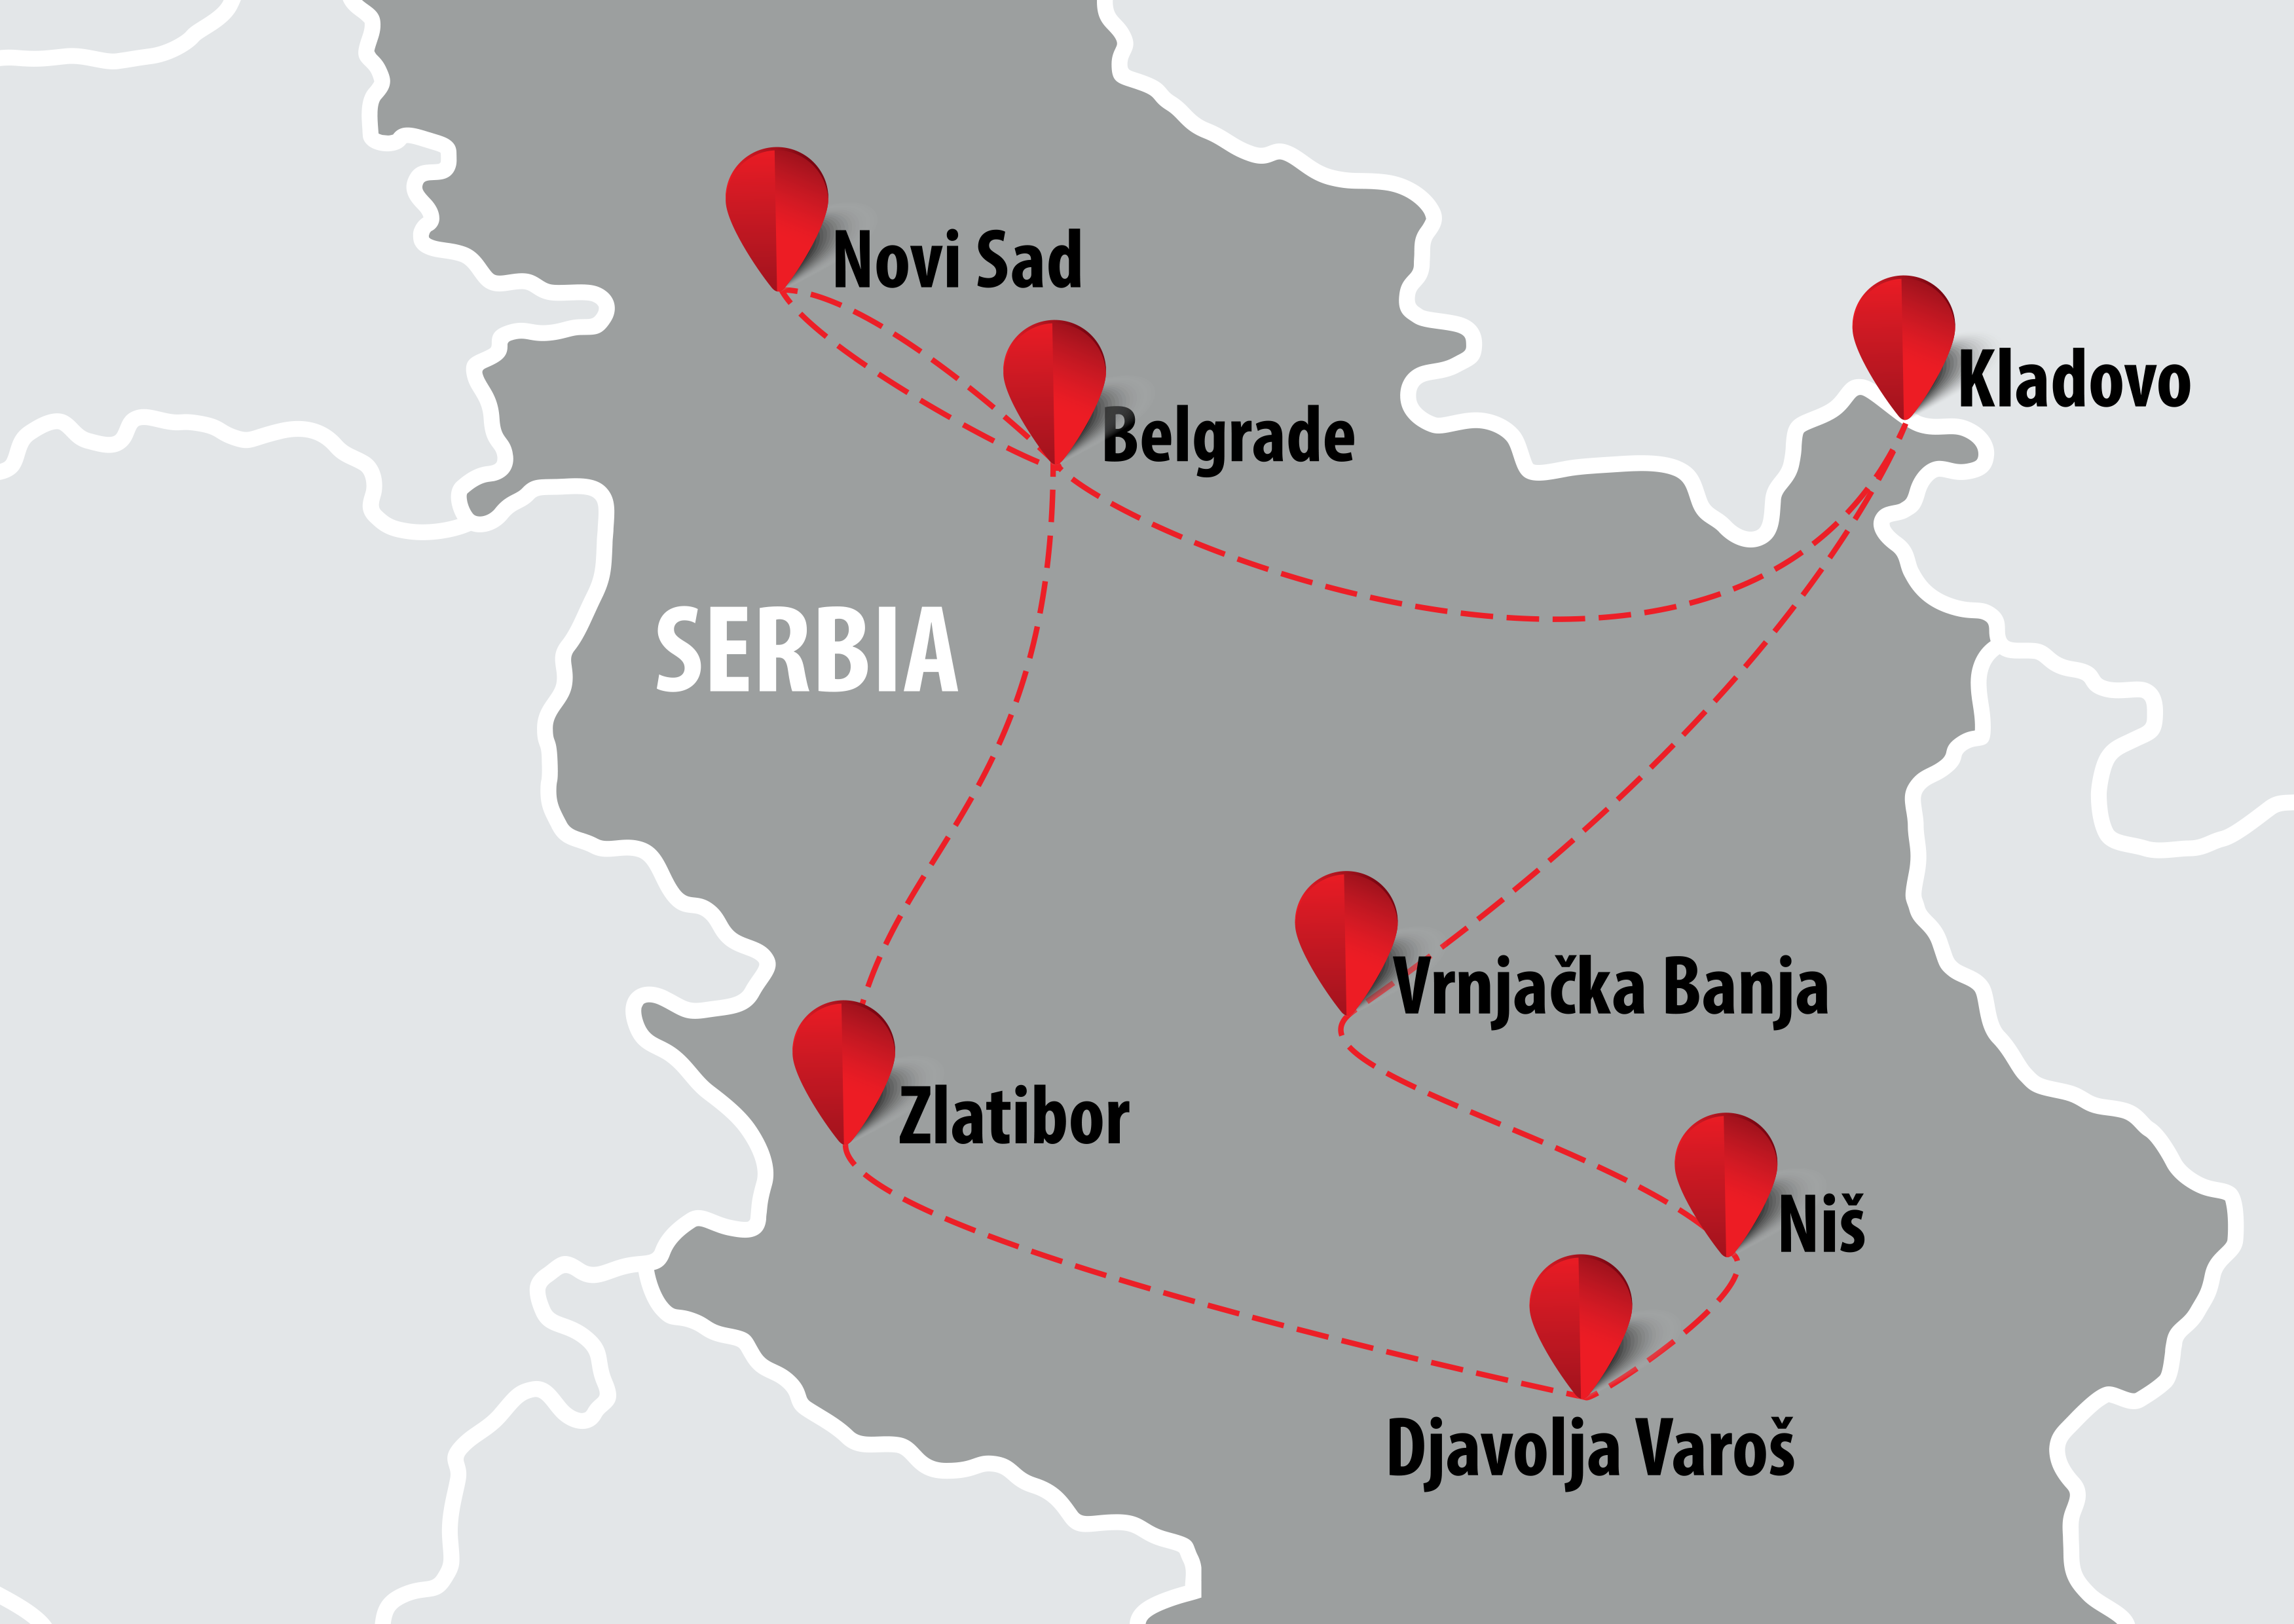 djavolja varos mapa Mapa Best of Srbija   Balkan Travel Centar djavolja varos mapa